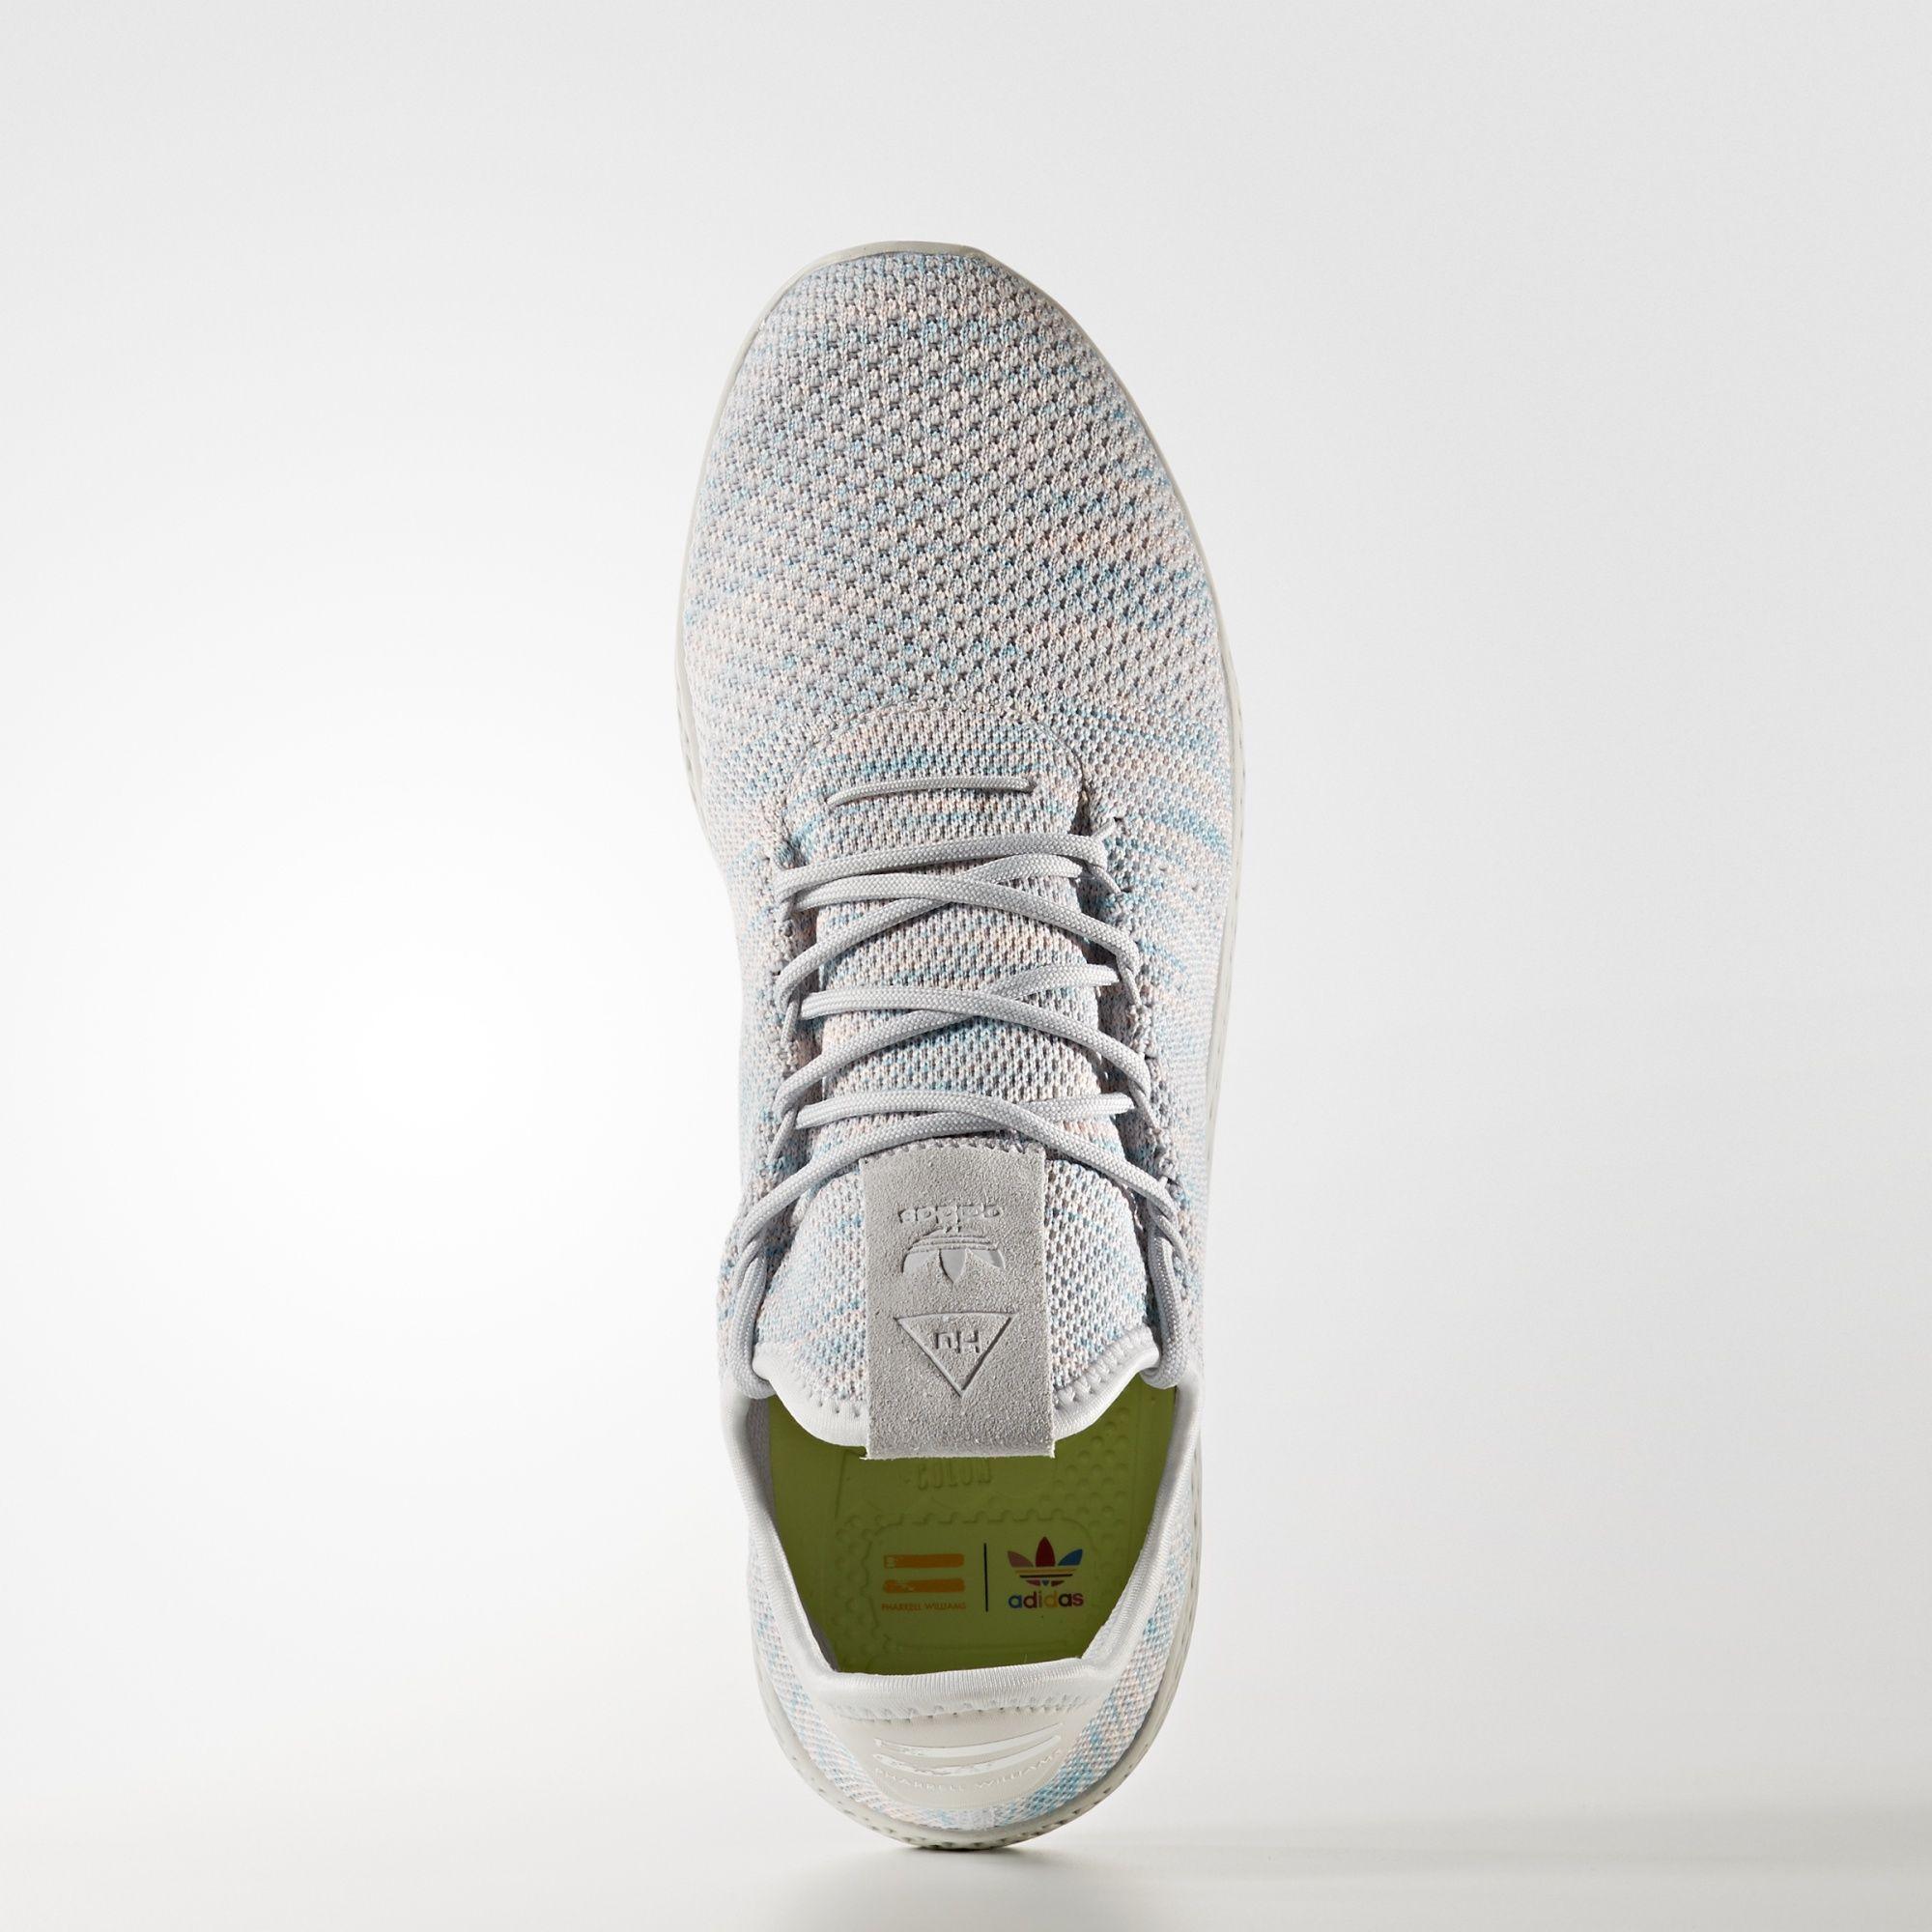 BY2671 Pharrell Williams x adidas Tennis HU Semi Frozen Yellow 1